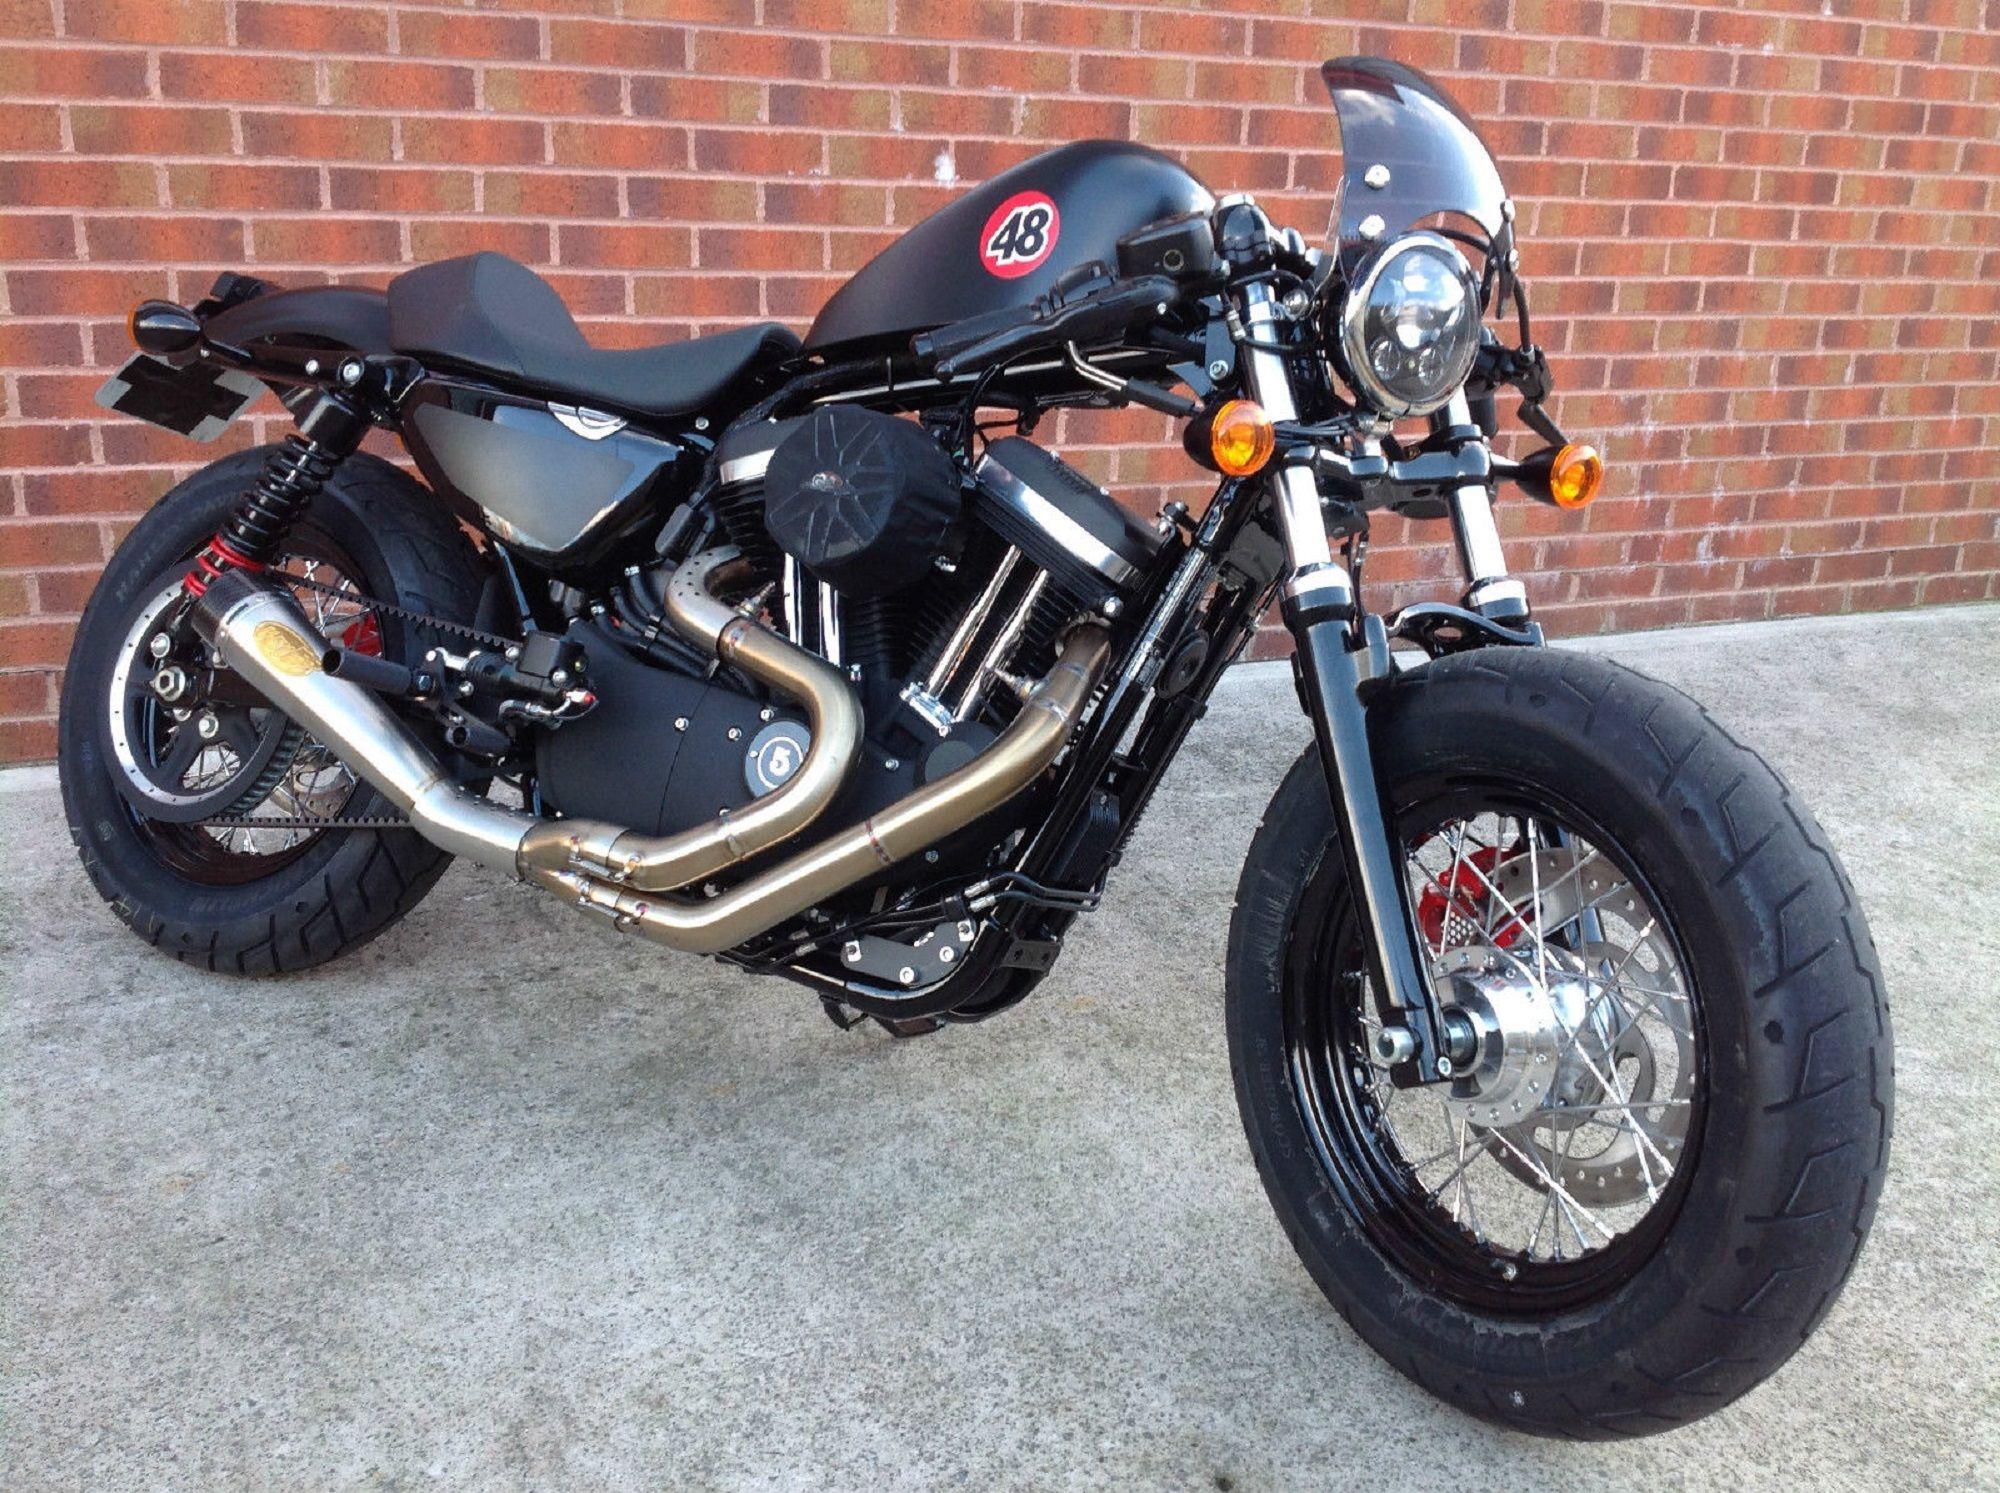 Cafe Racer Parts Uk Ide Dimage De Moto Suzuki Gn250 Kit Harley Sugakiya Motor